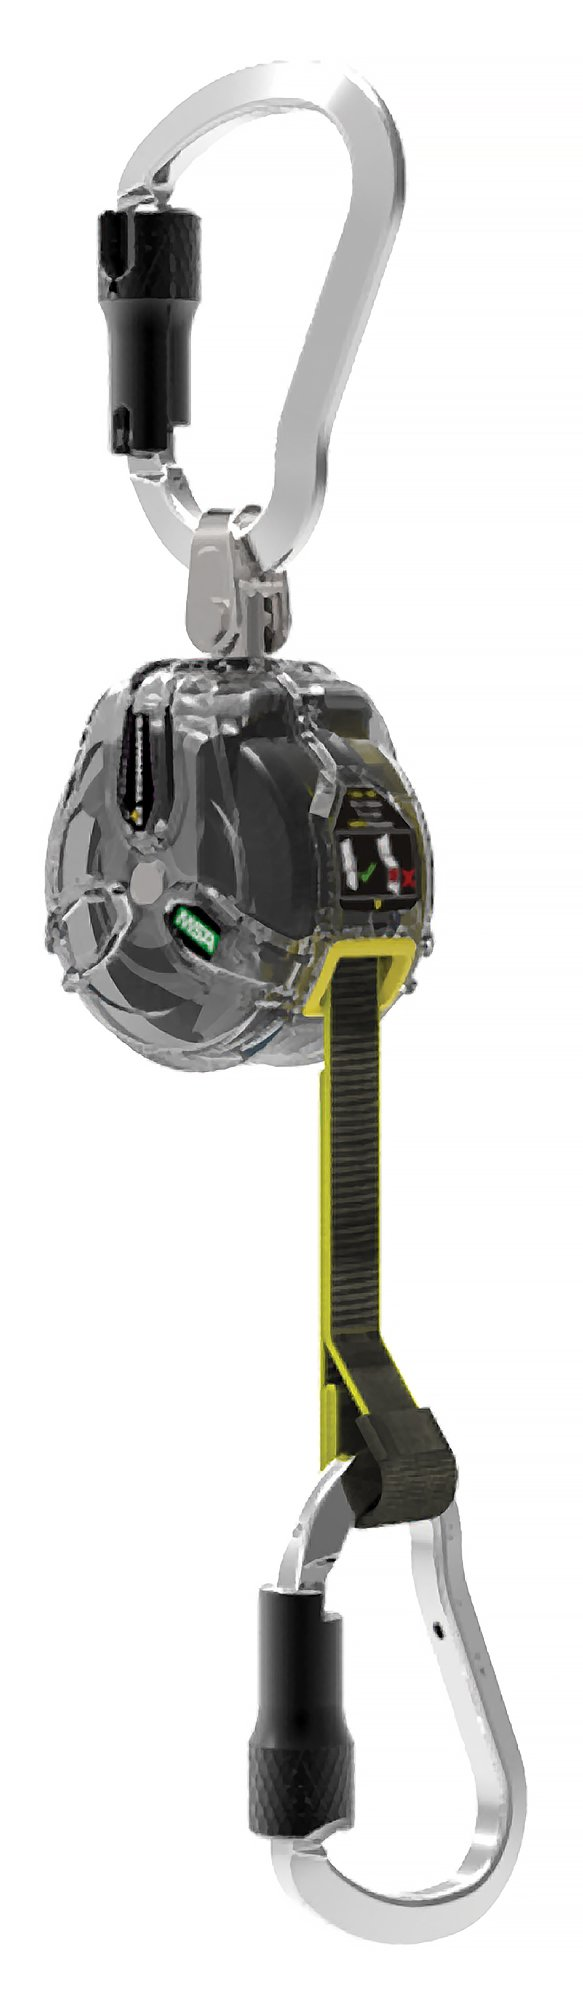 MSA Safety 63011-00N Latchways Mini PFL, Single-Leg, Triple-Lock Carabiner (Top), 6' (1.8 m), Clear, Small